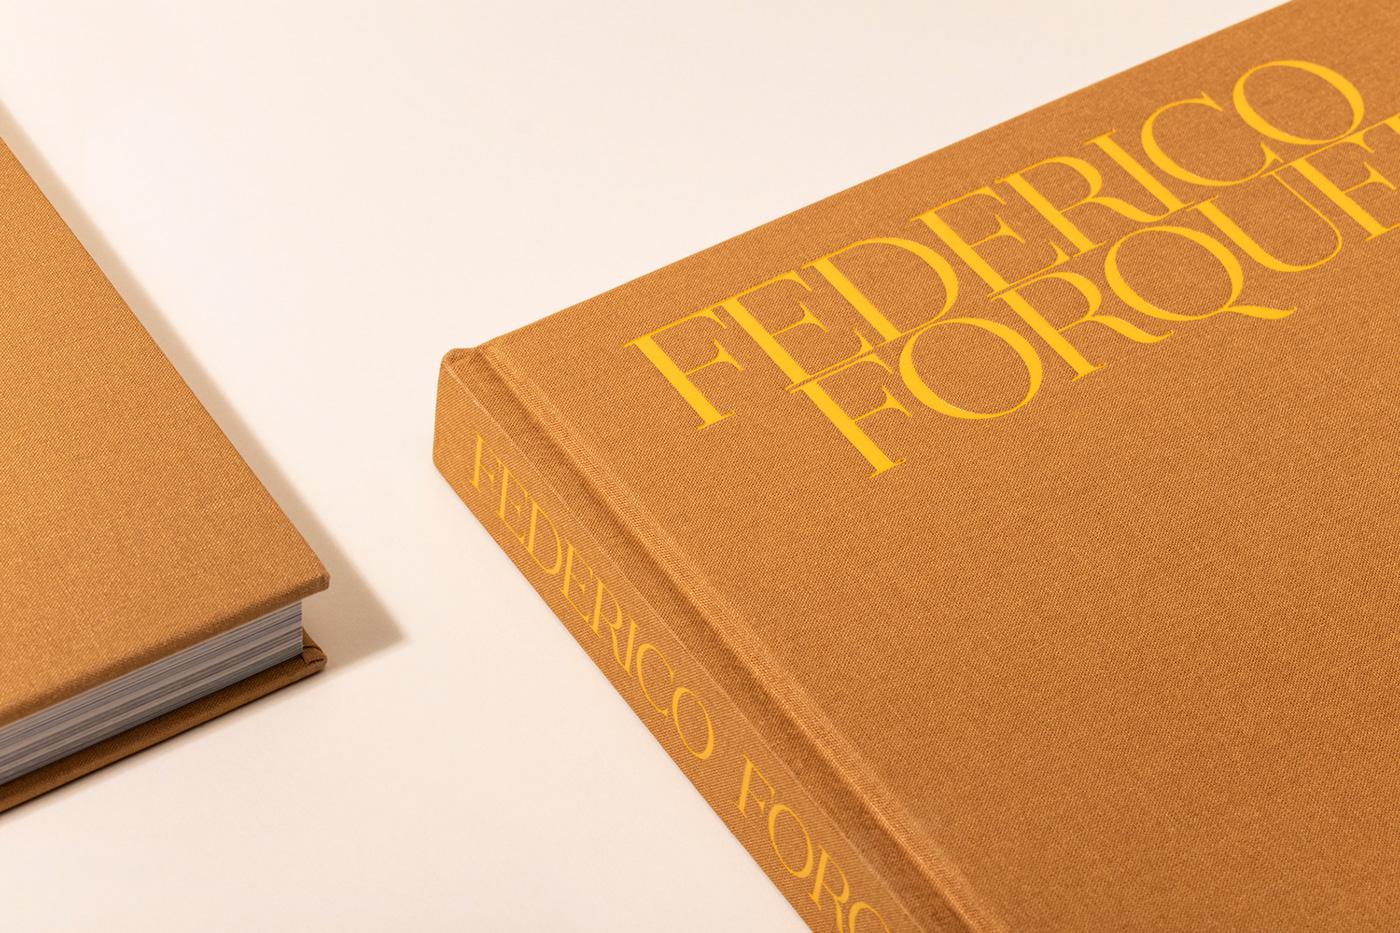 Archive book book design editorial editorial design  Fashion  gardens interiors Layout publishing